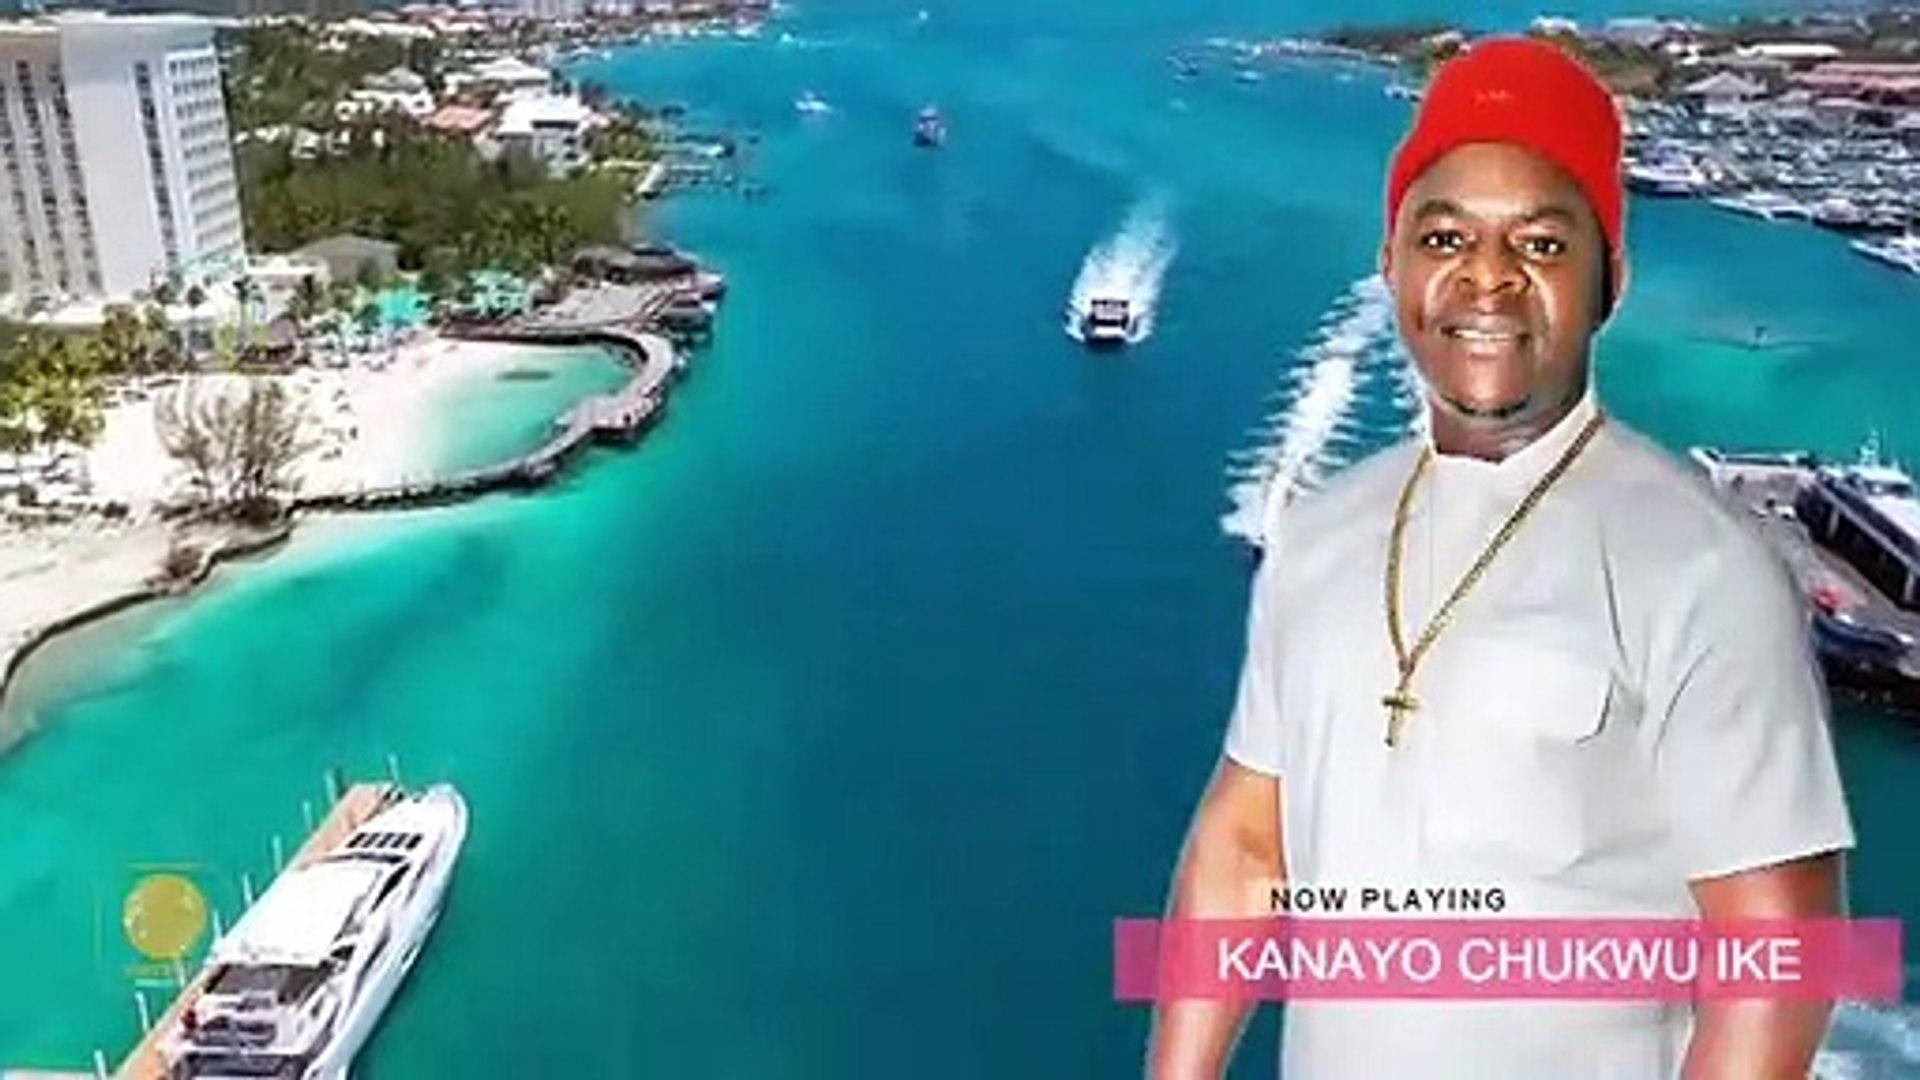 KANAYO CHUKWU IKE - CHIEF ONYENZE NWA AMOBI | Nigerian Highlife Music